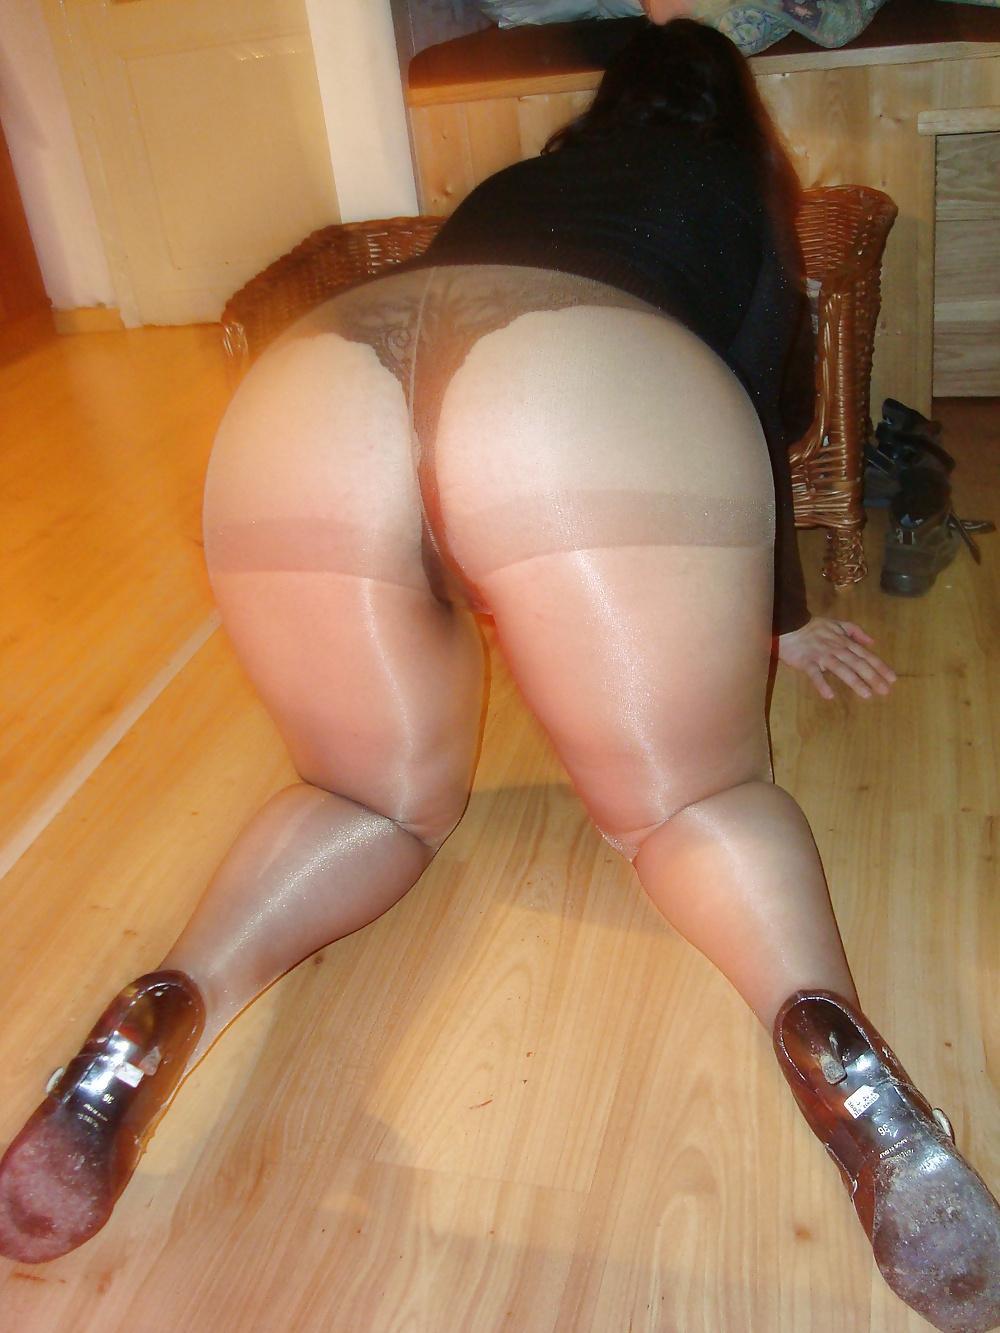 Black booty pantyhose pics, free ebony porn